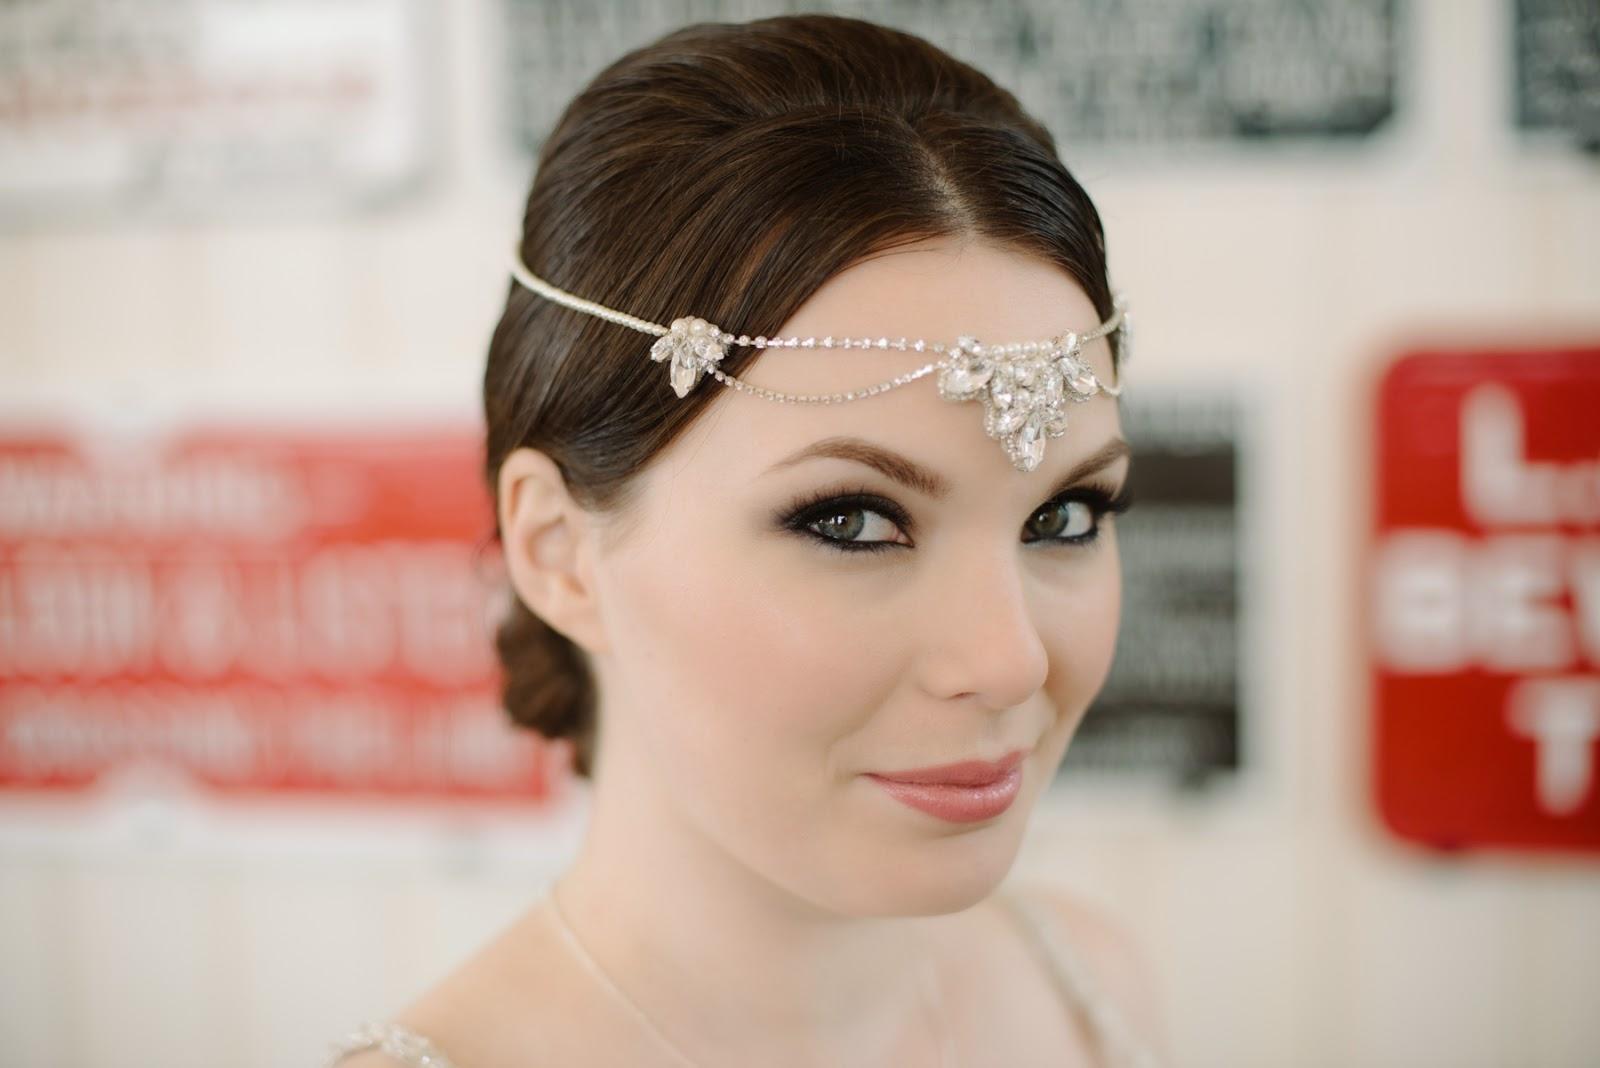 art deco forehead piece, forehead jewellery 2015, wedding hair forehead 2015,